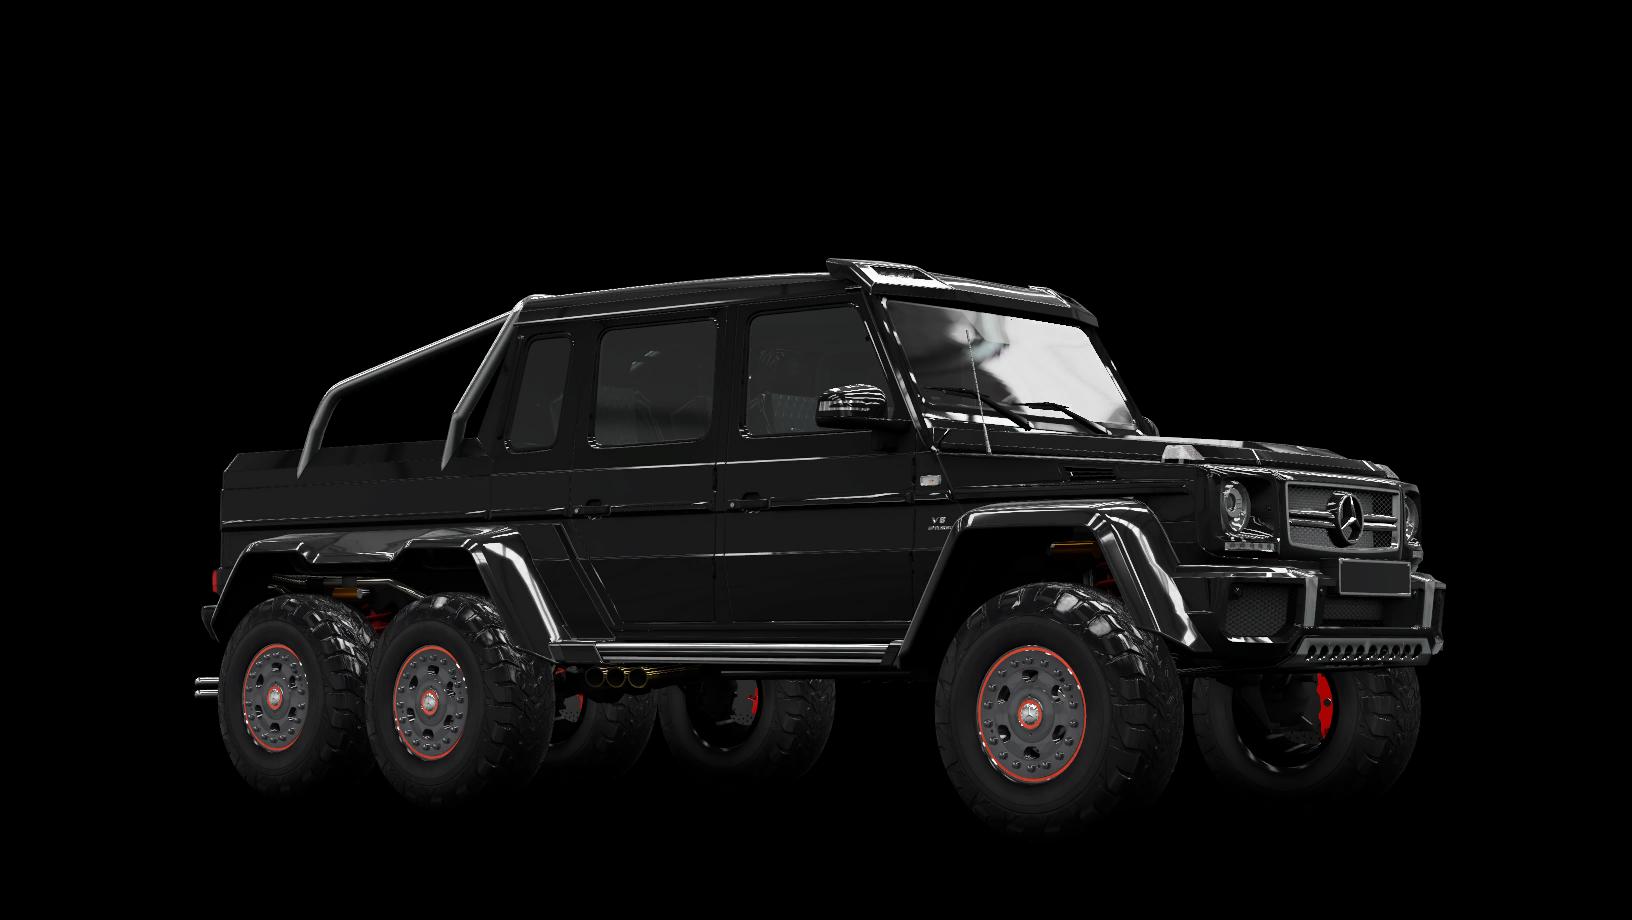 Mercedes Benz G 63 Amg 6x6 Forza Wiki Fandom